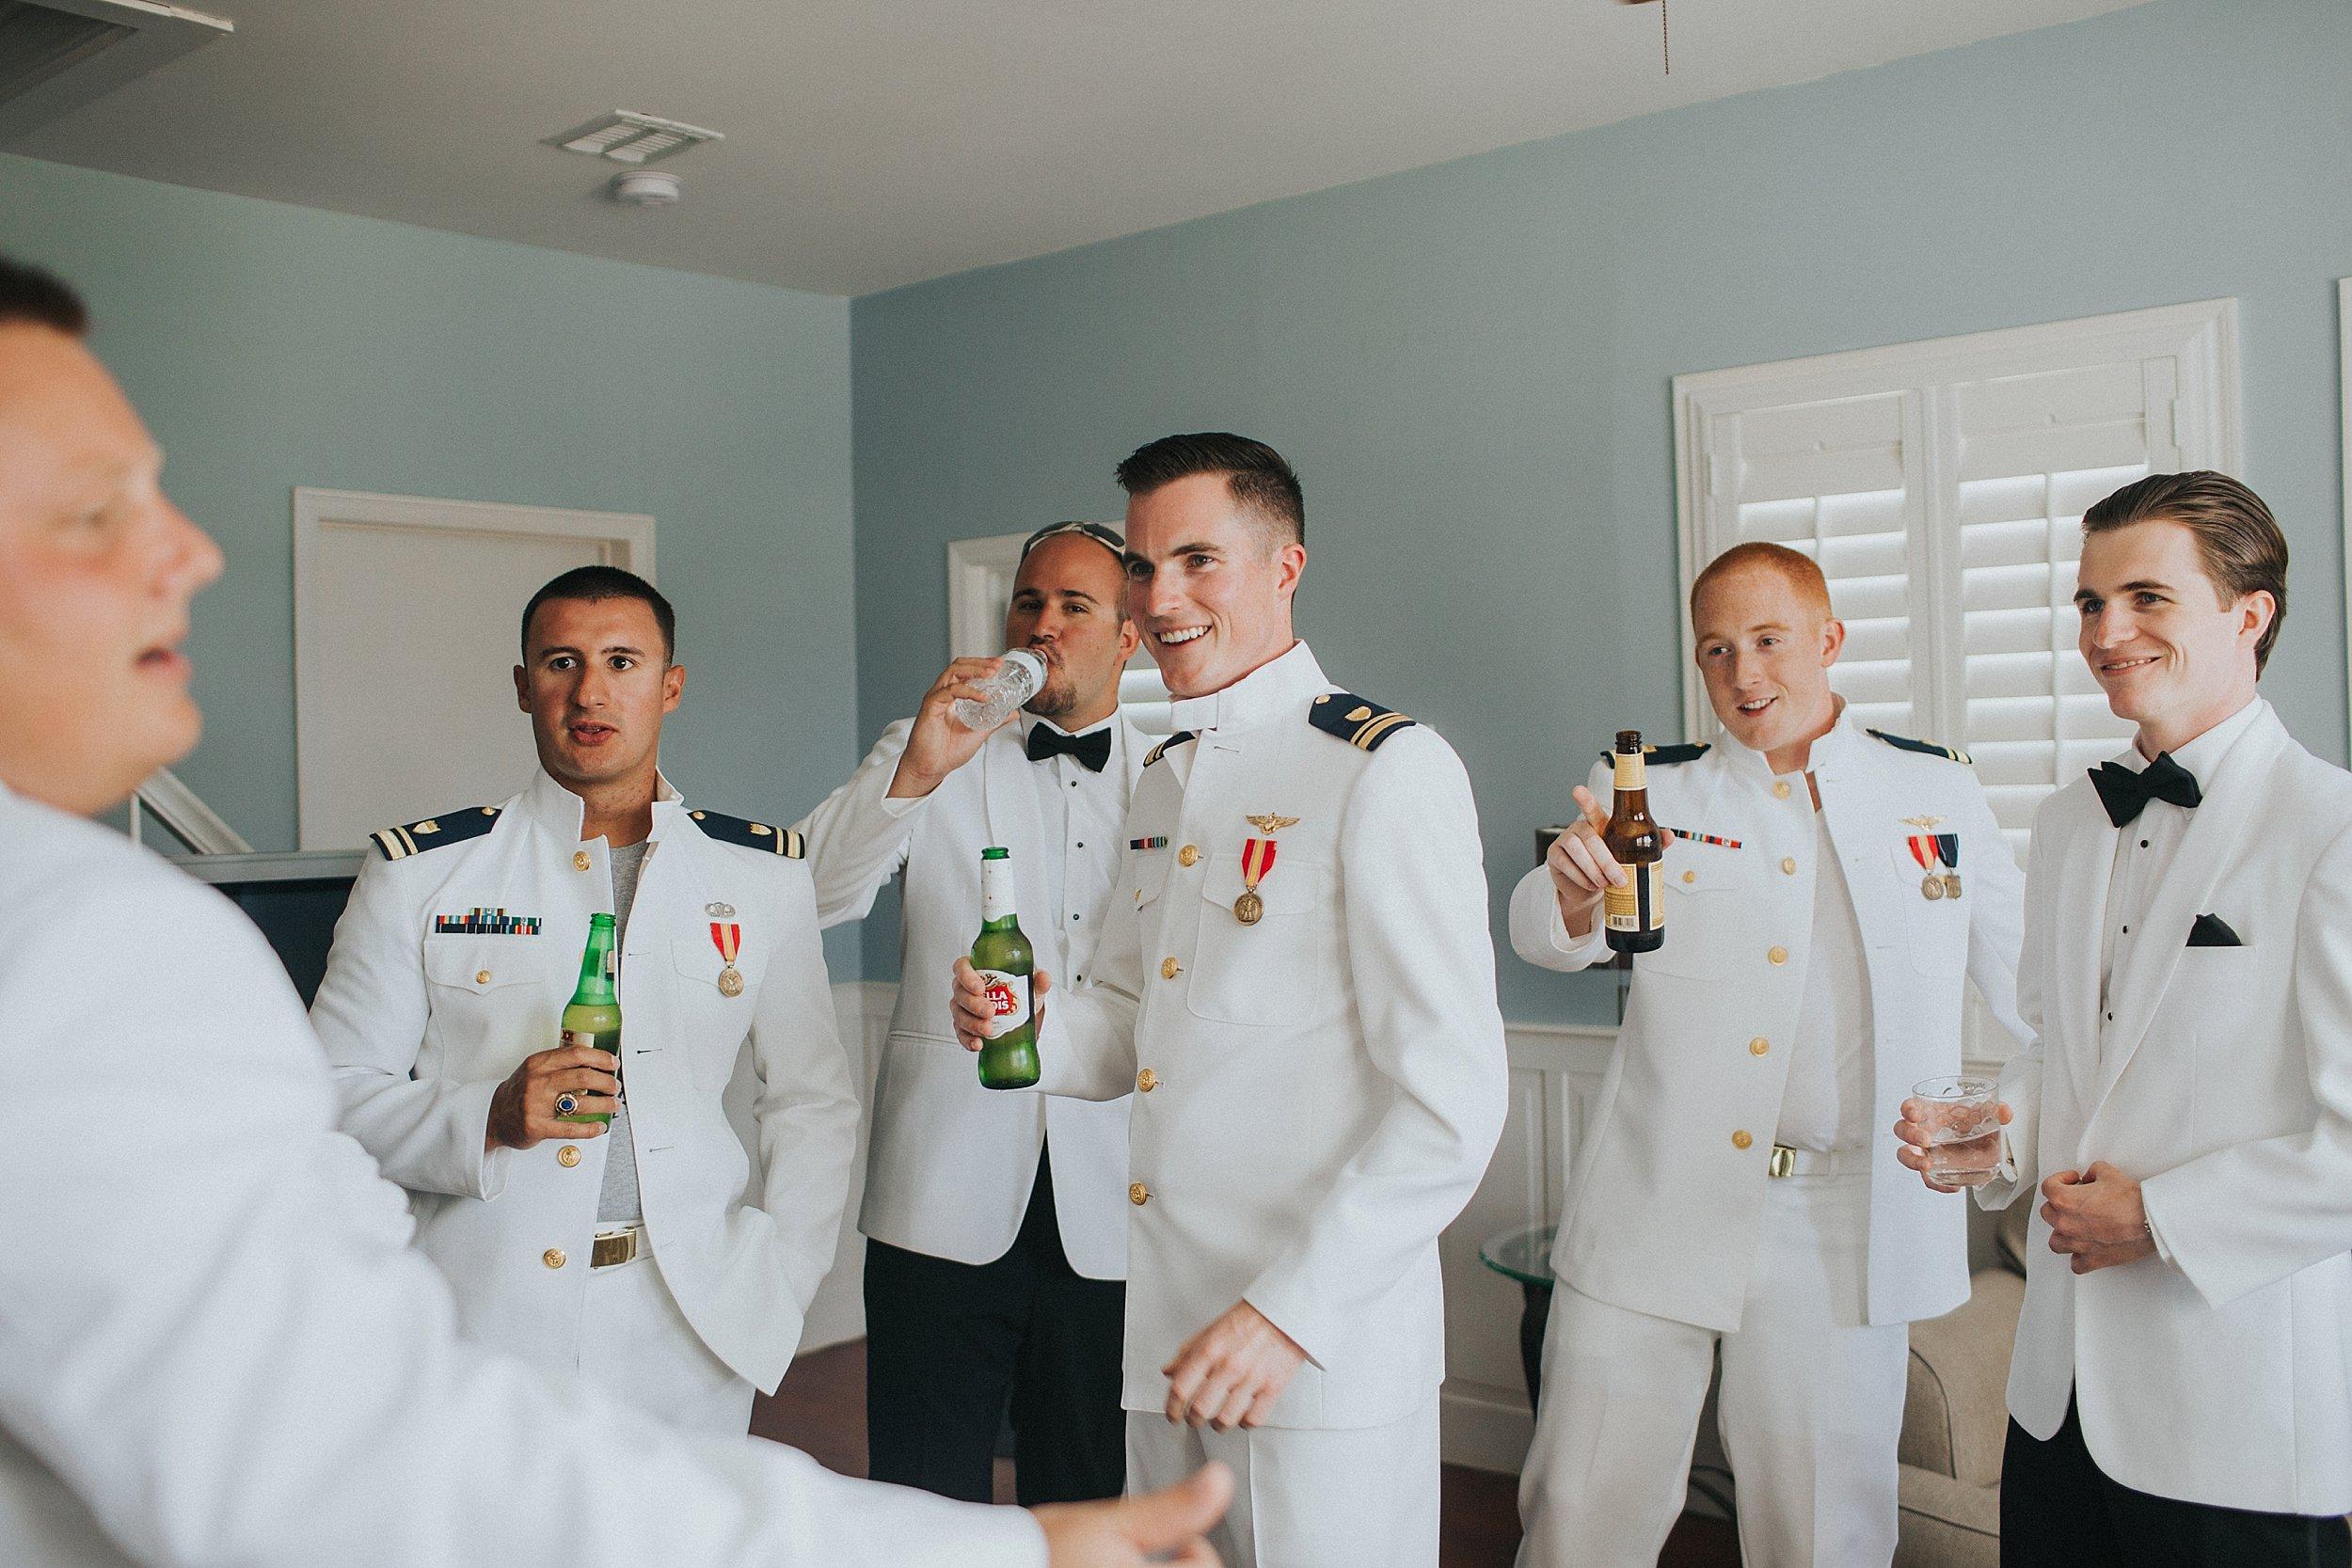 groomsmen having fun on the wedding day